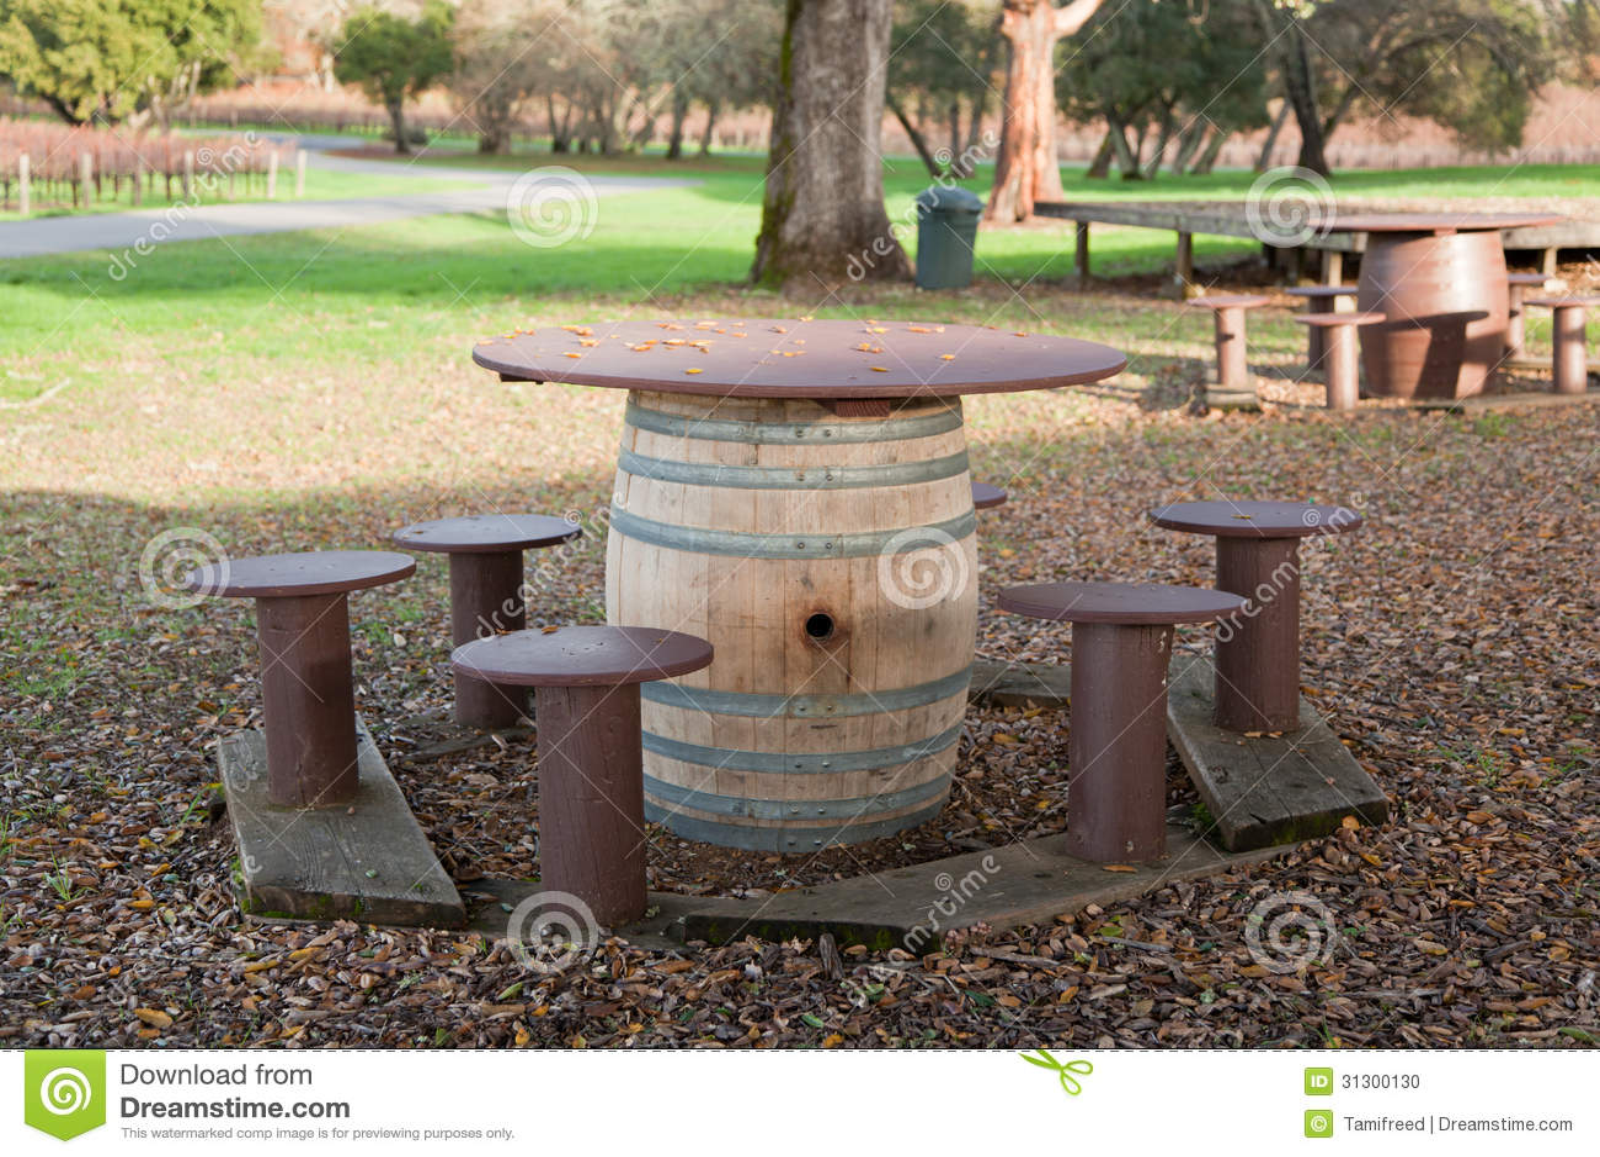 Wine barrel picnic table stock photo image 31300130 for 1 2 wine barrel table